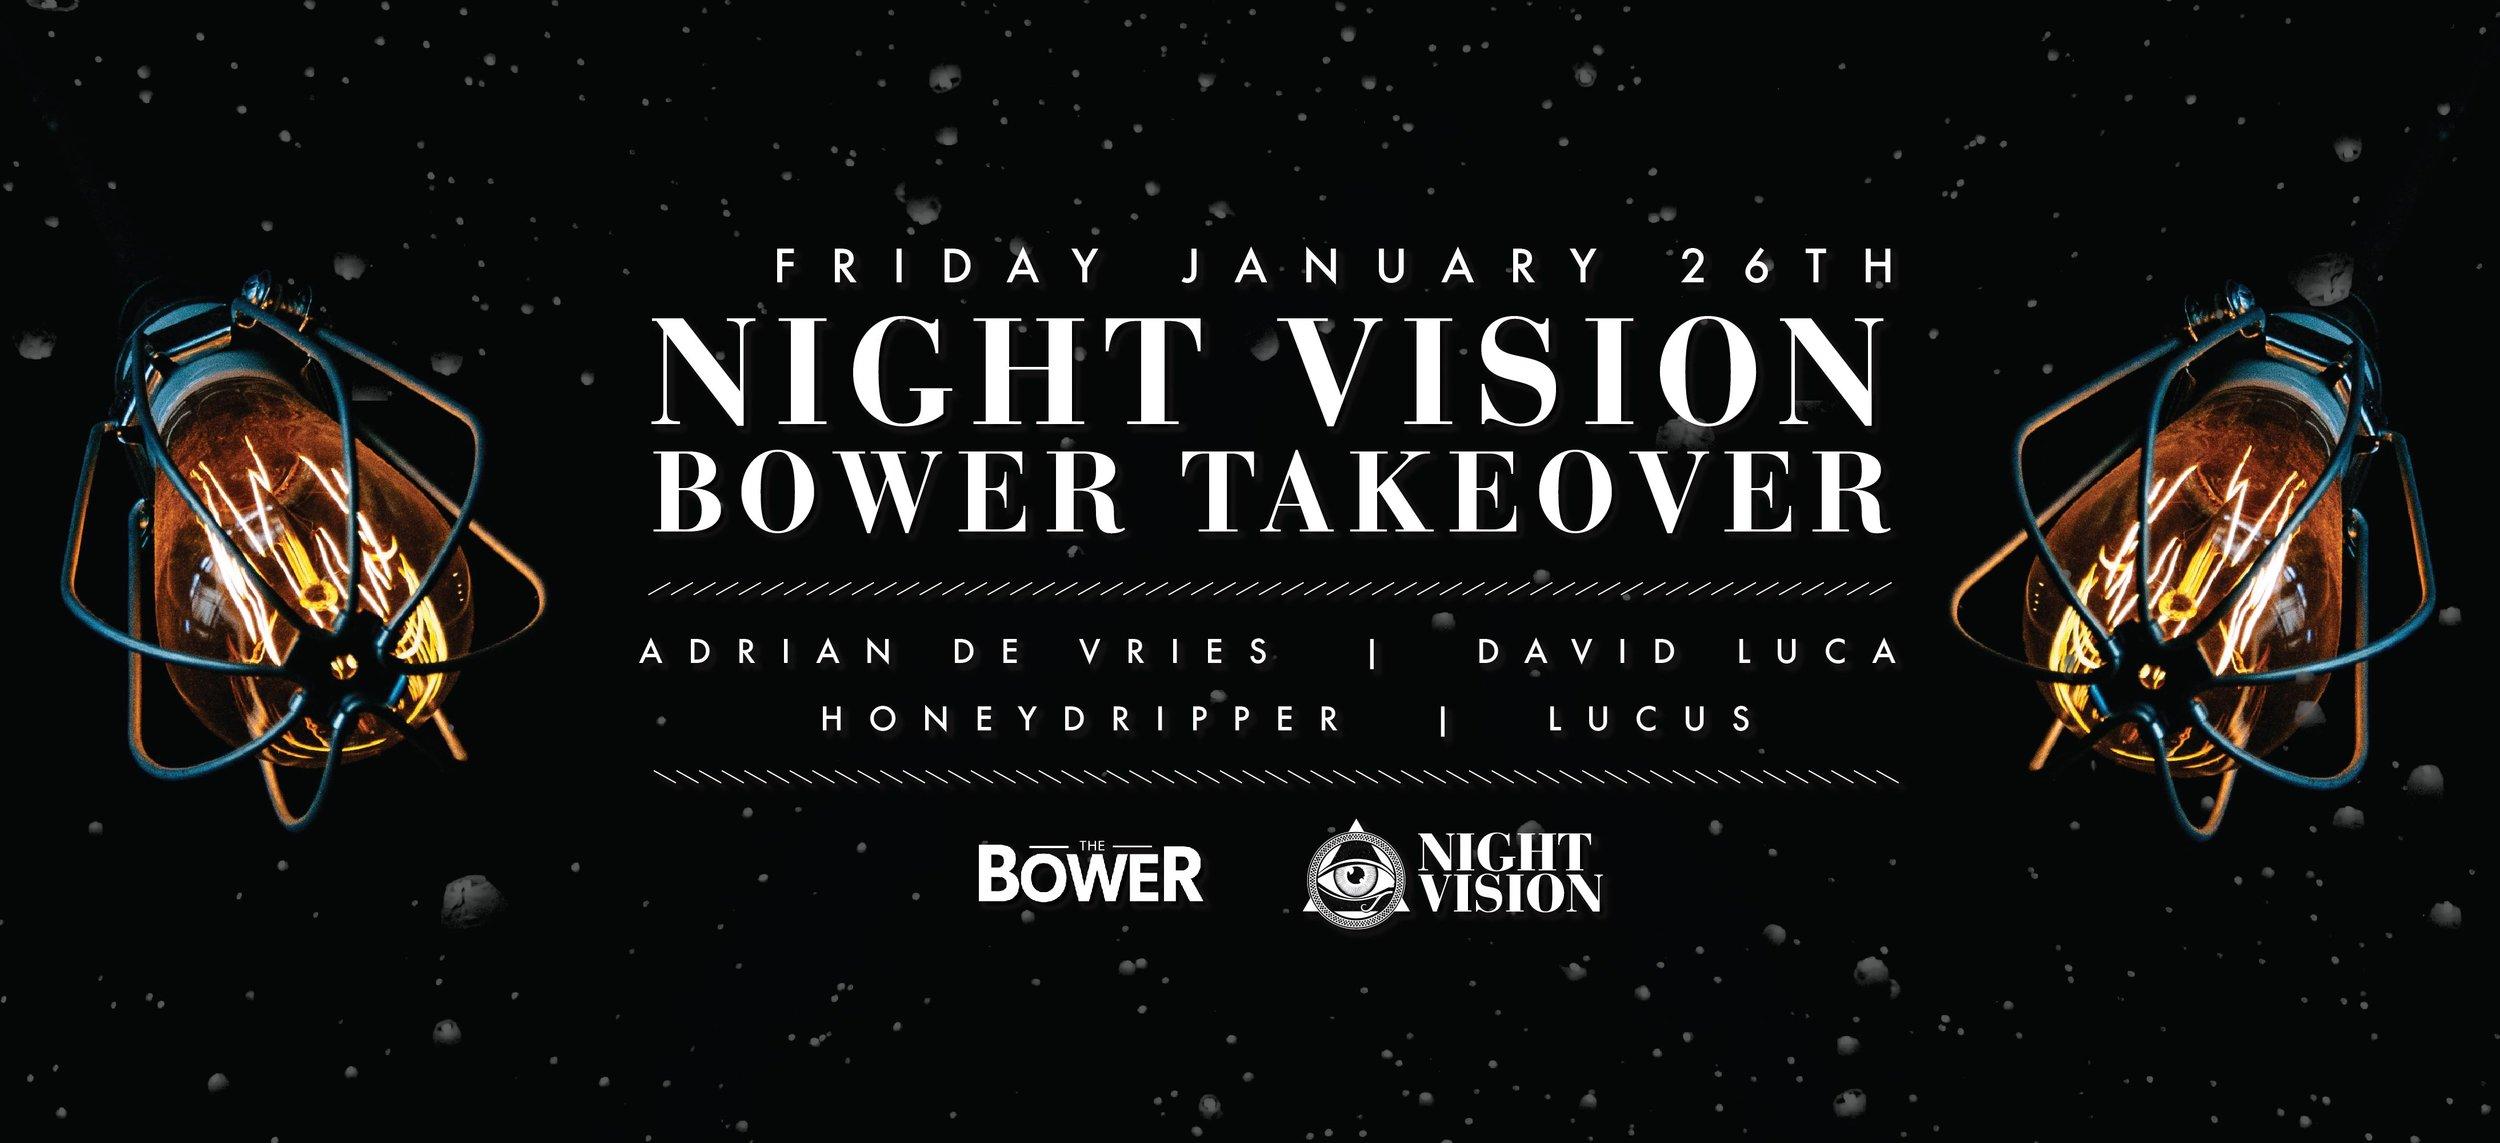 The-Bower-January-01.jpg